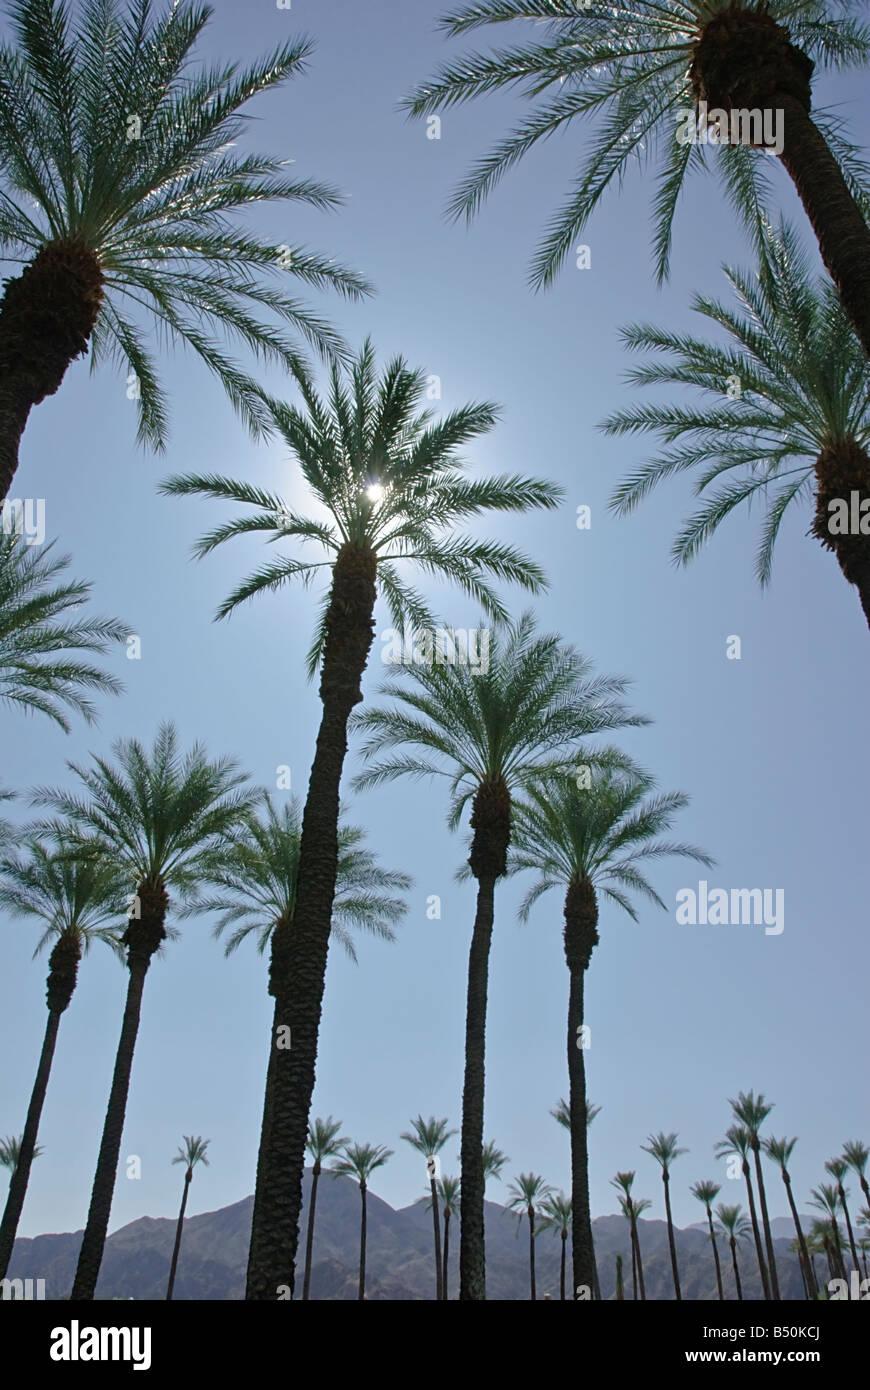 Palme California Palm tree s CA fan di palma, native California Palm tree palme Arecaceae Palmae Palmaceae Immagini Stock